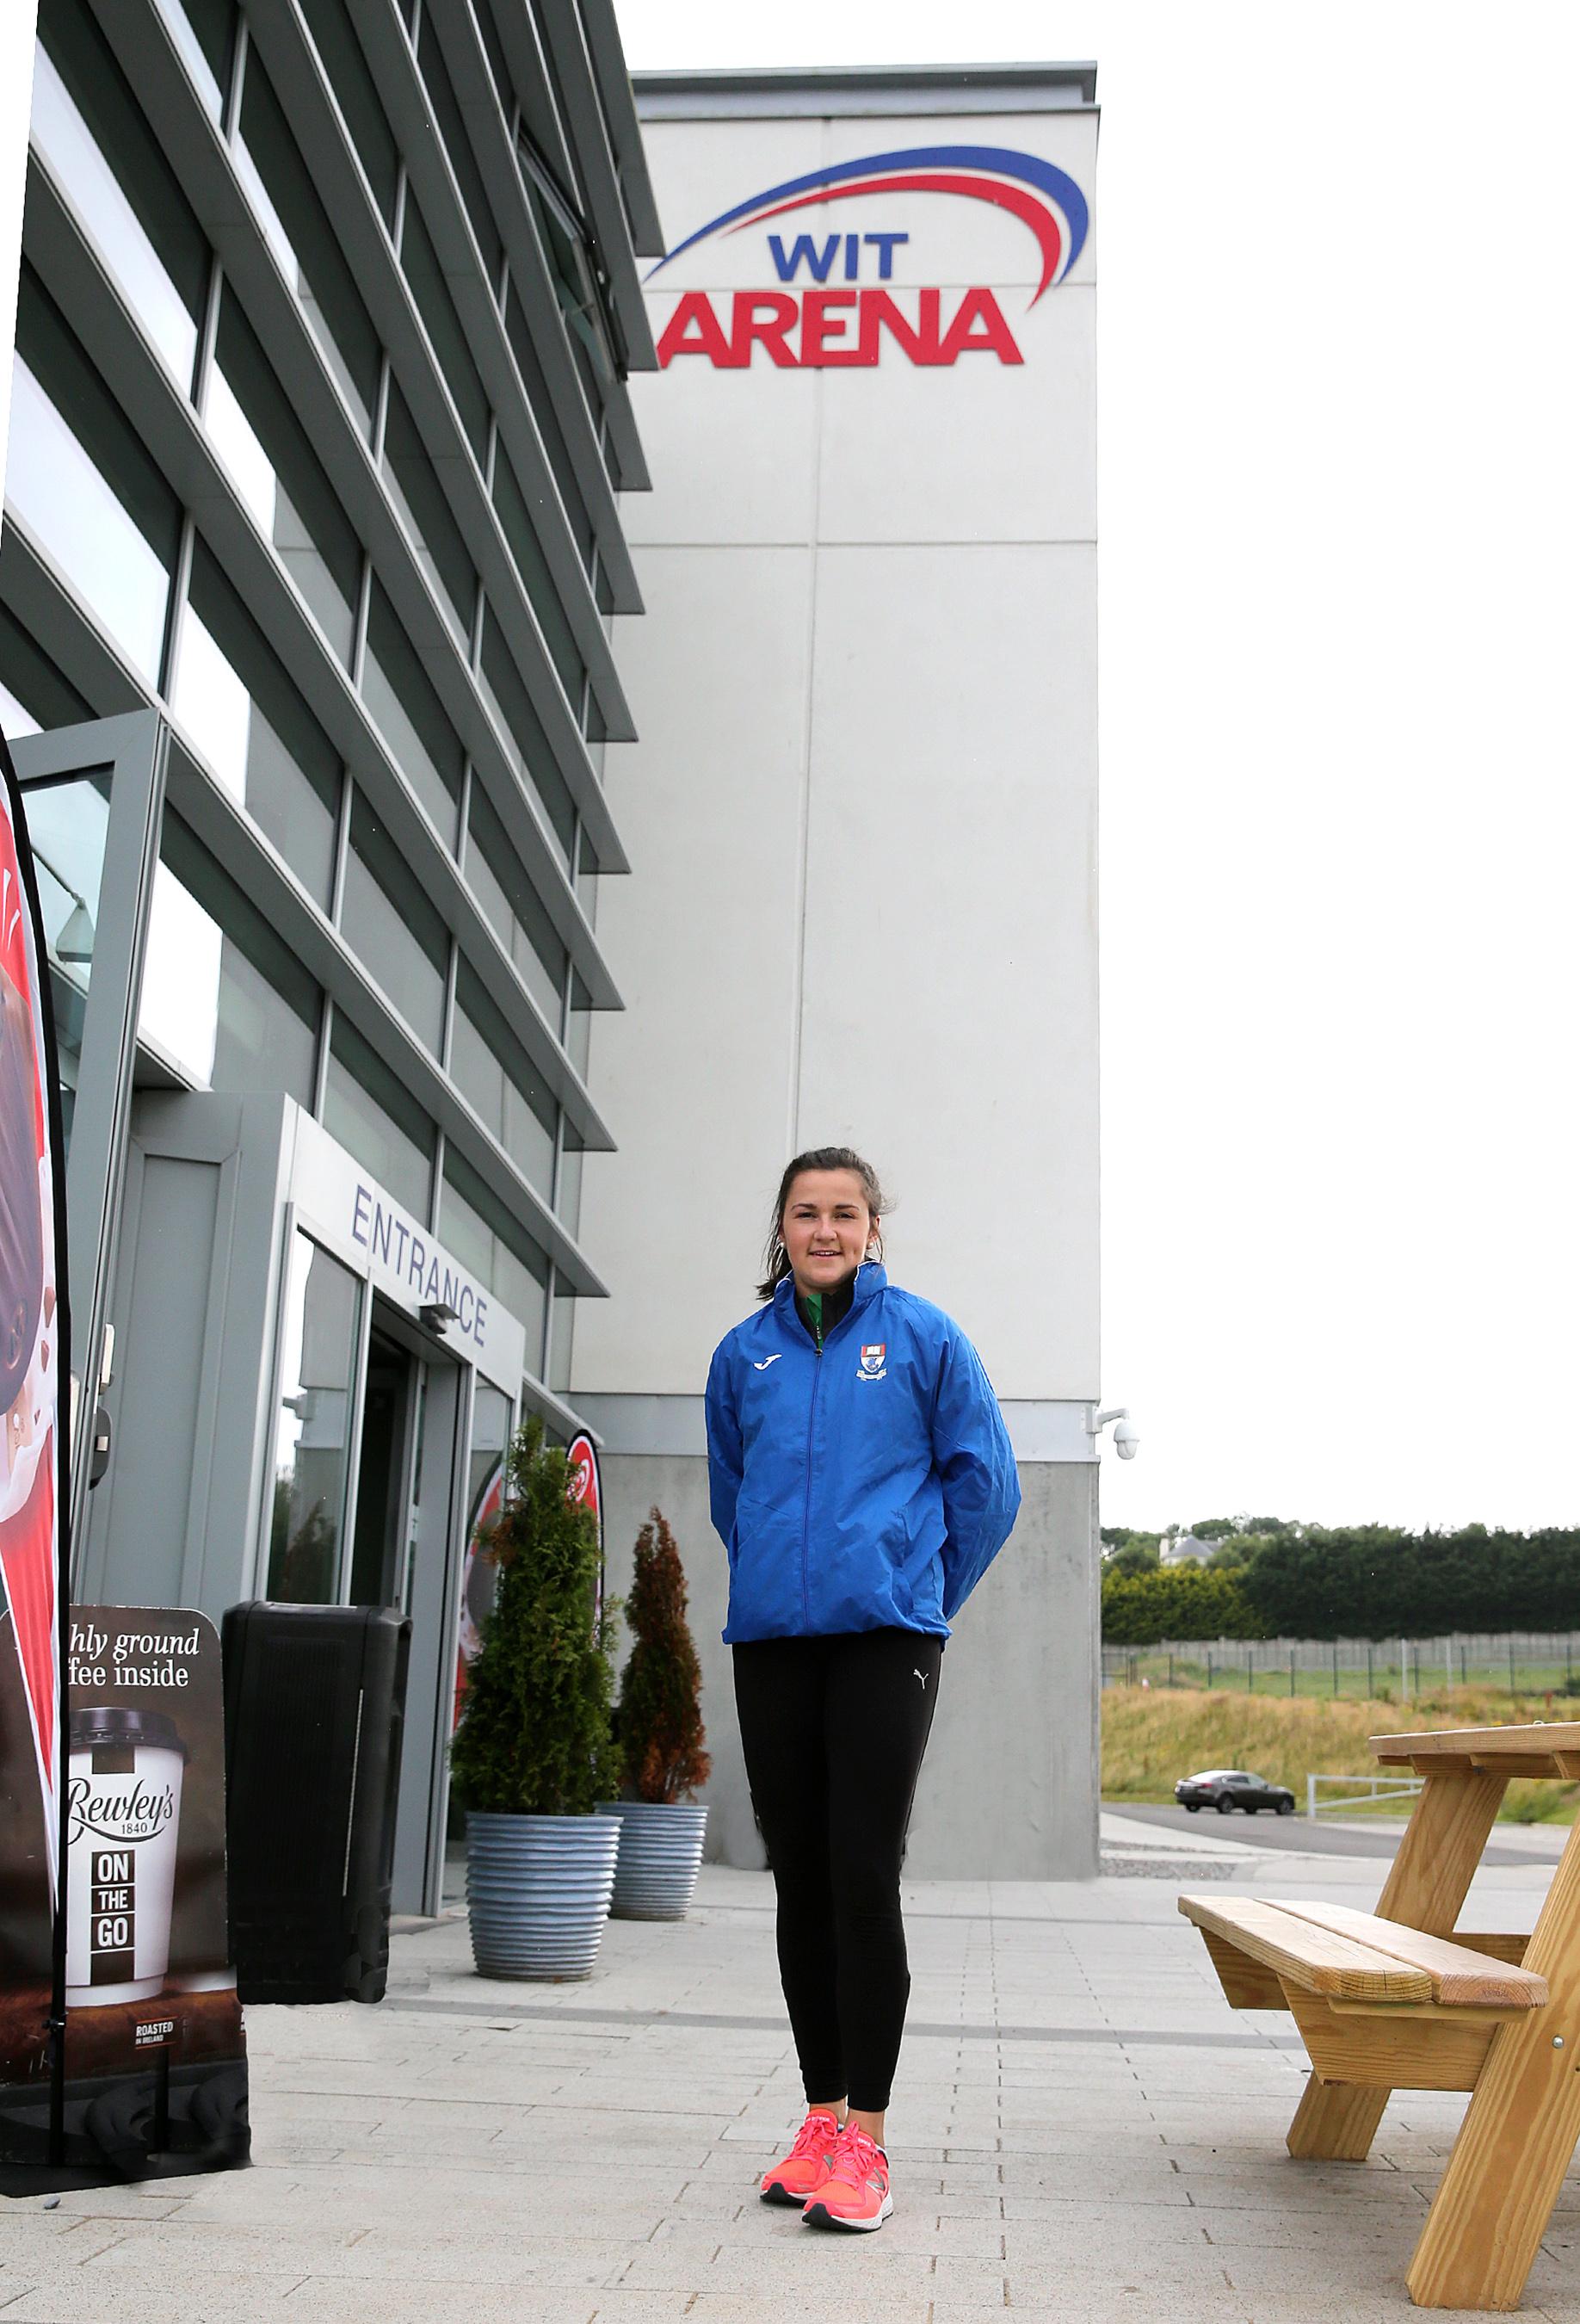 Irish International sprinter, Phil Healy in WIT Arena's High Performance Gym